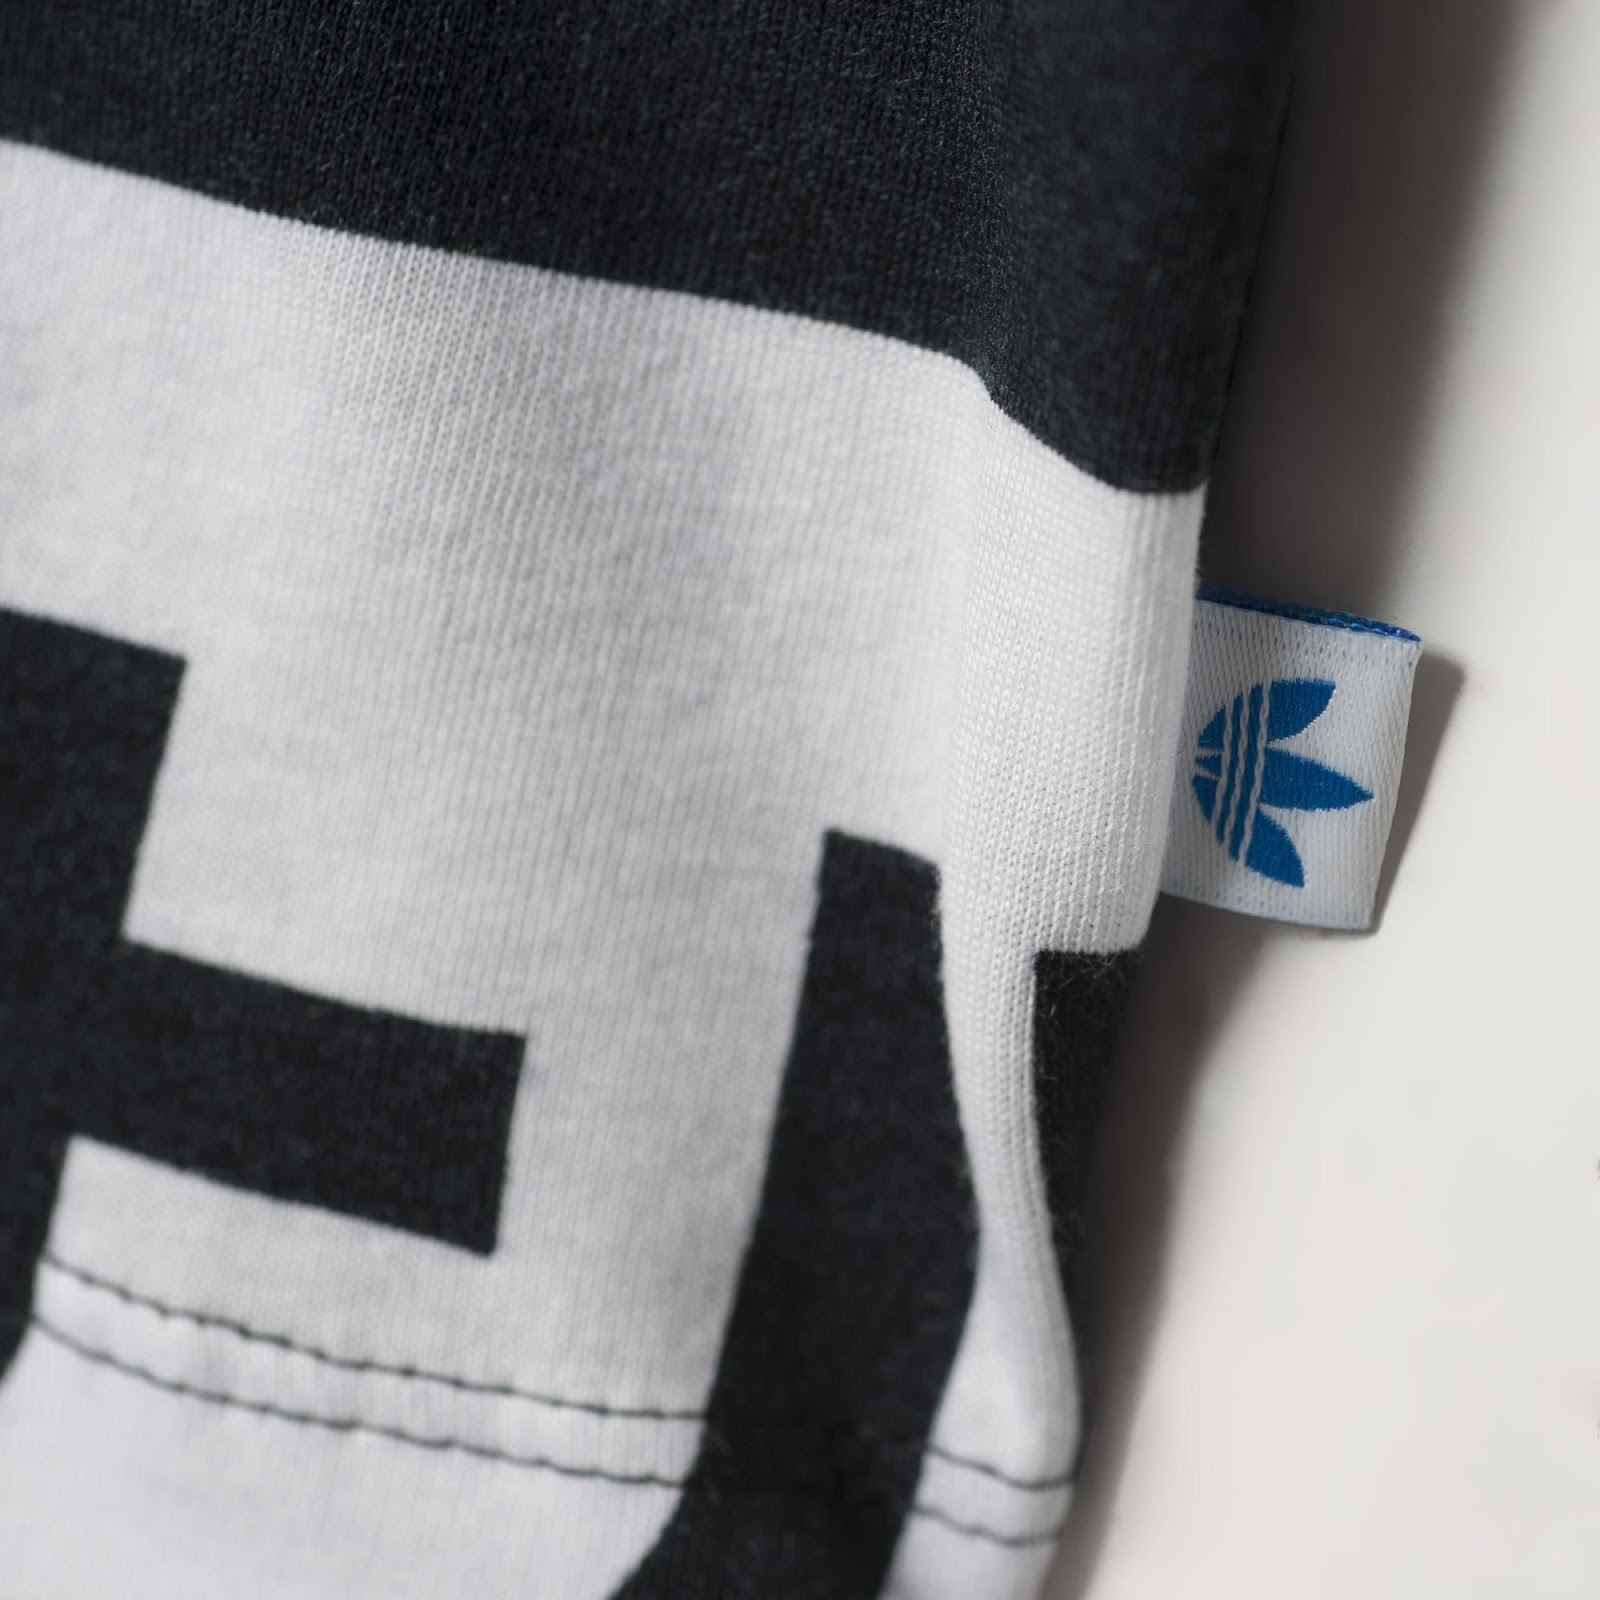 660e27f38cf Sneakers and Streetwear stuff  adidas Originals - Japan Typo Aop Tee